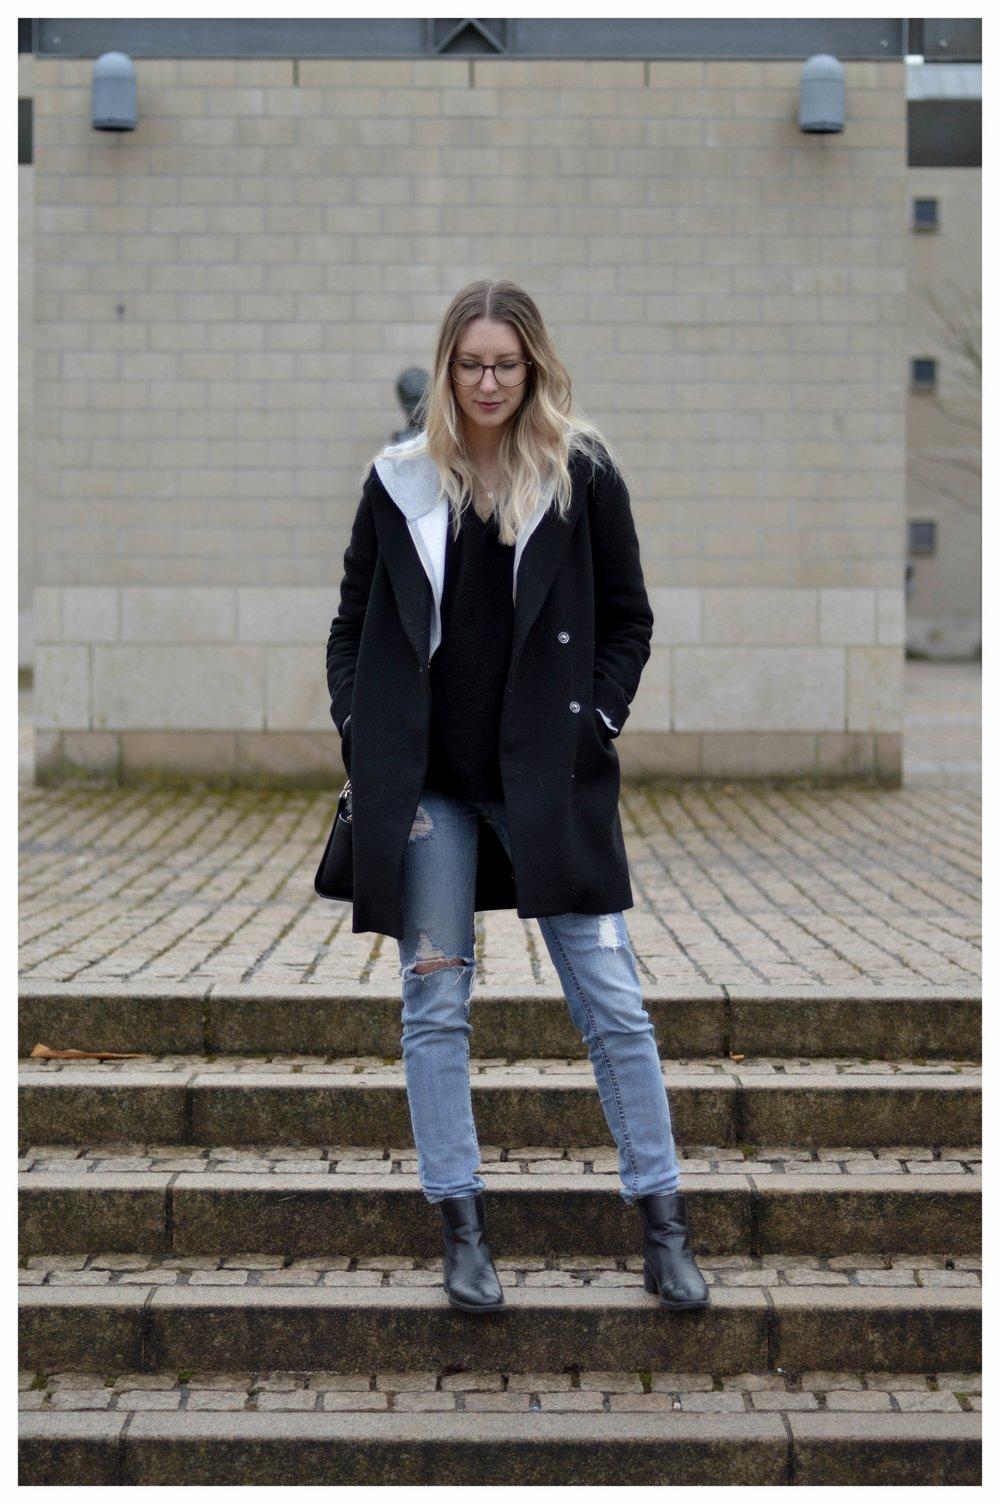 Black Coat Hoodie & Ripped Jeans - OSIARAH.COM (6 sur 54).jpg